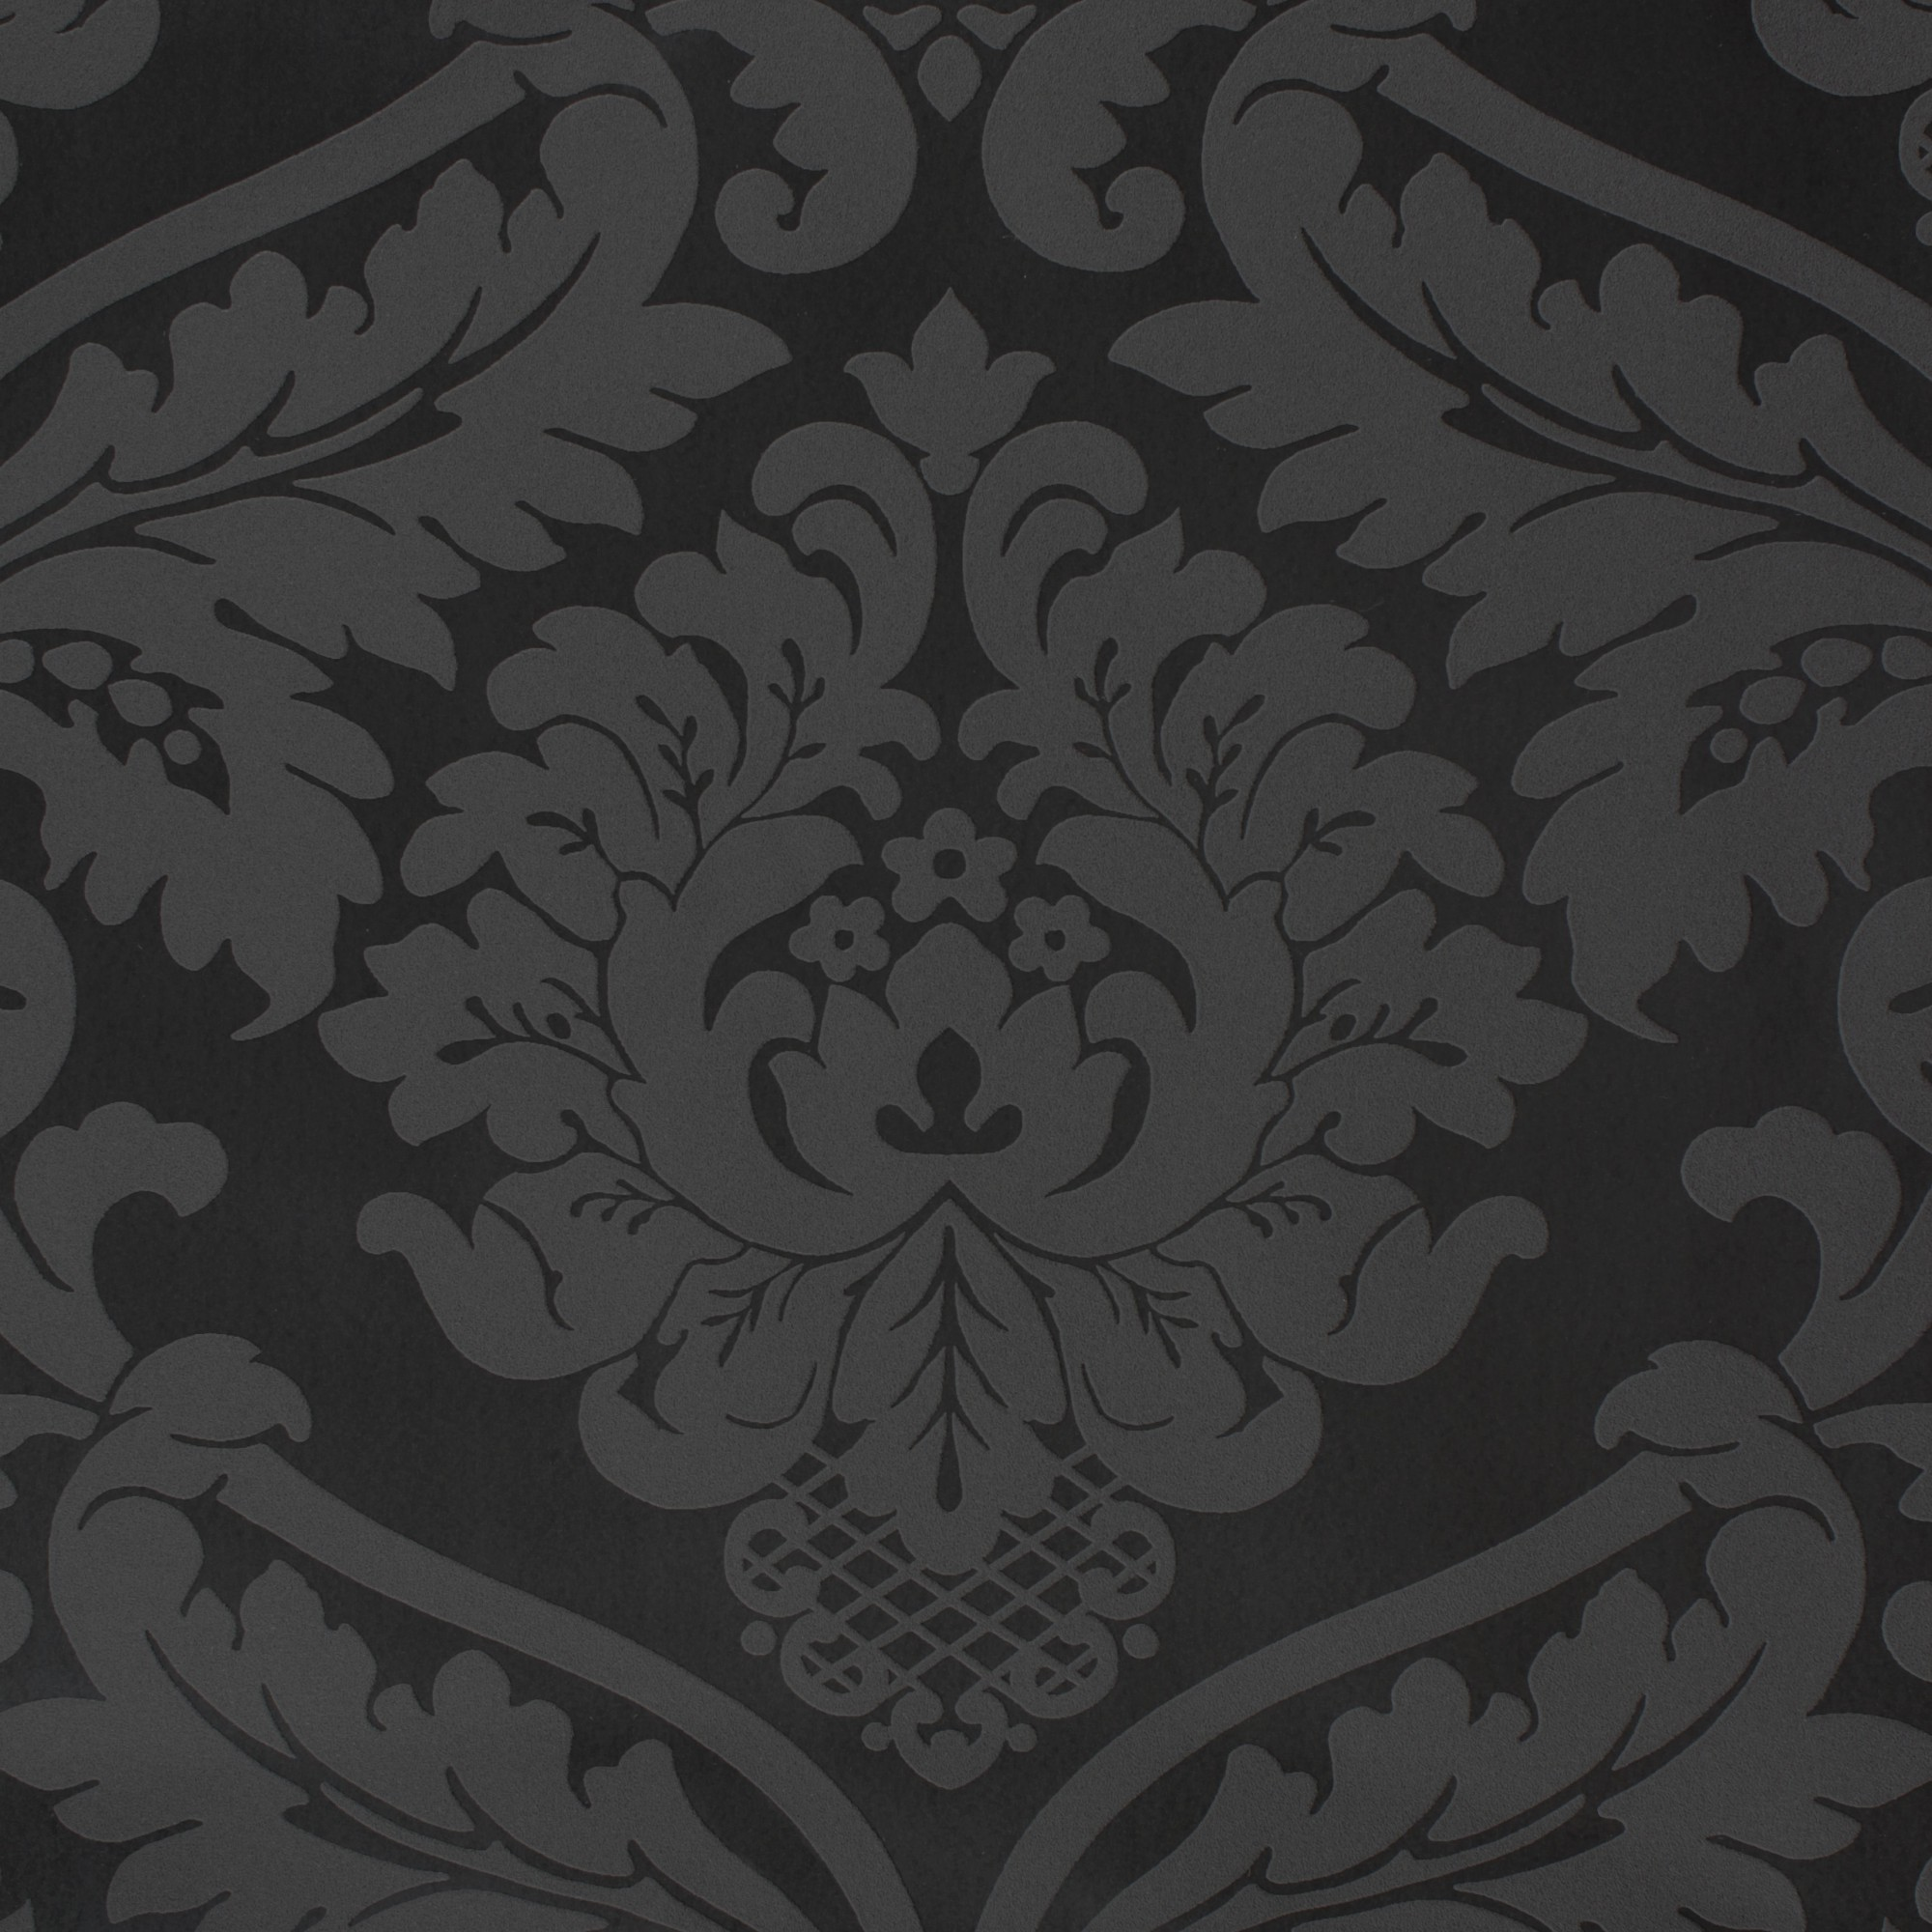 Retro barock tapete black white 5526 31 schwarz for Retro tapete